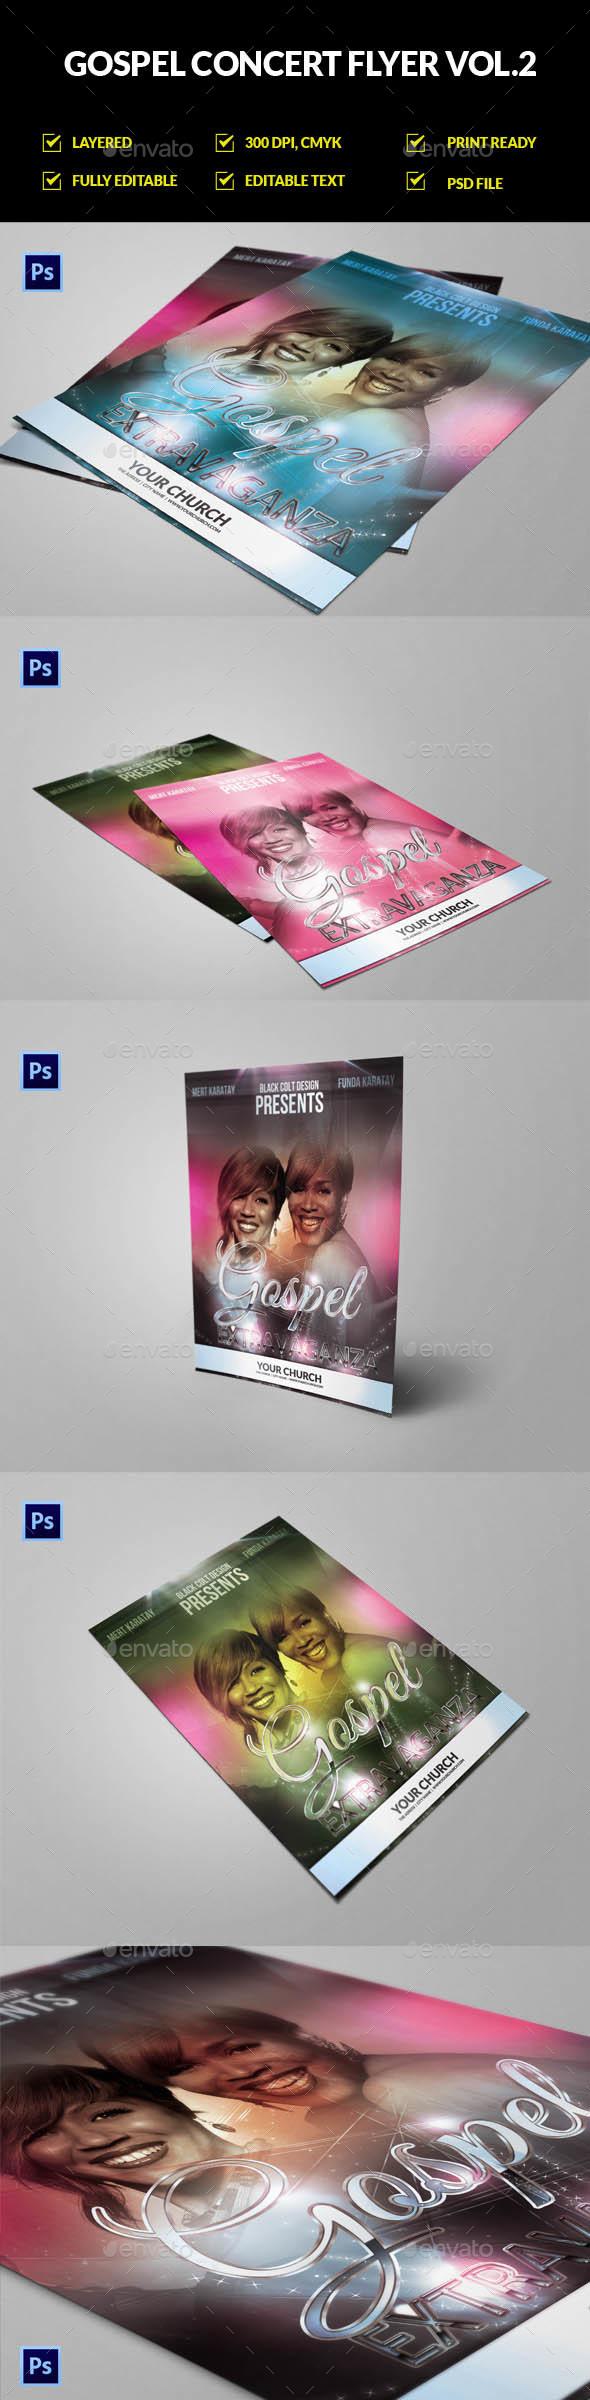 Church Concert Flyer Graphics, Designs & Templates